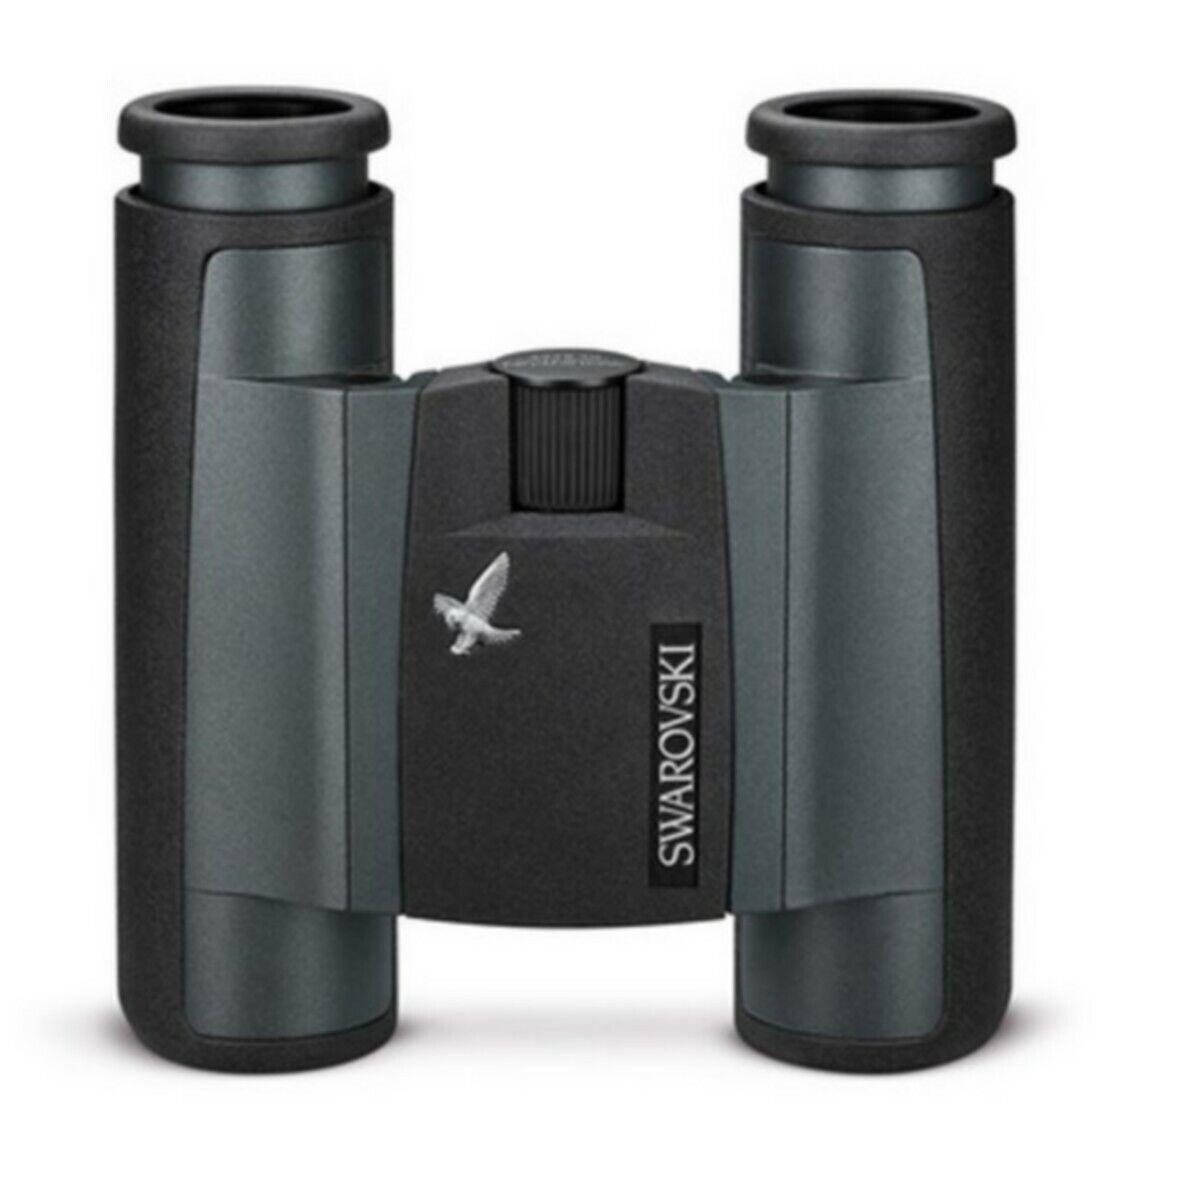 Binocular CL Pocket Mountain 8x25 B Binocolo Jumelle - SWAROVSKI OPTIK